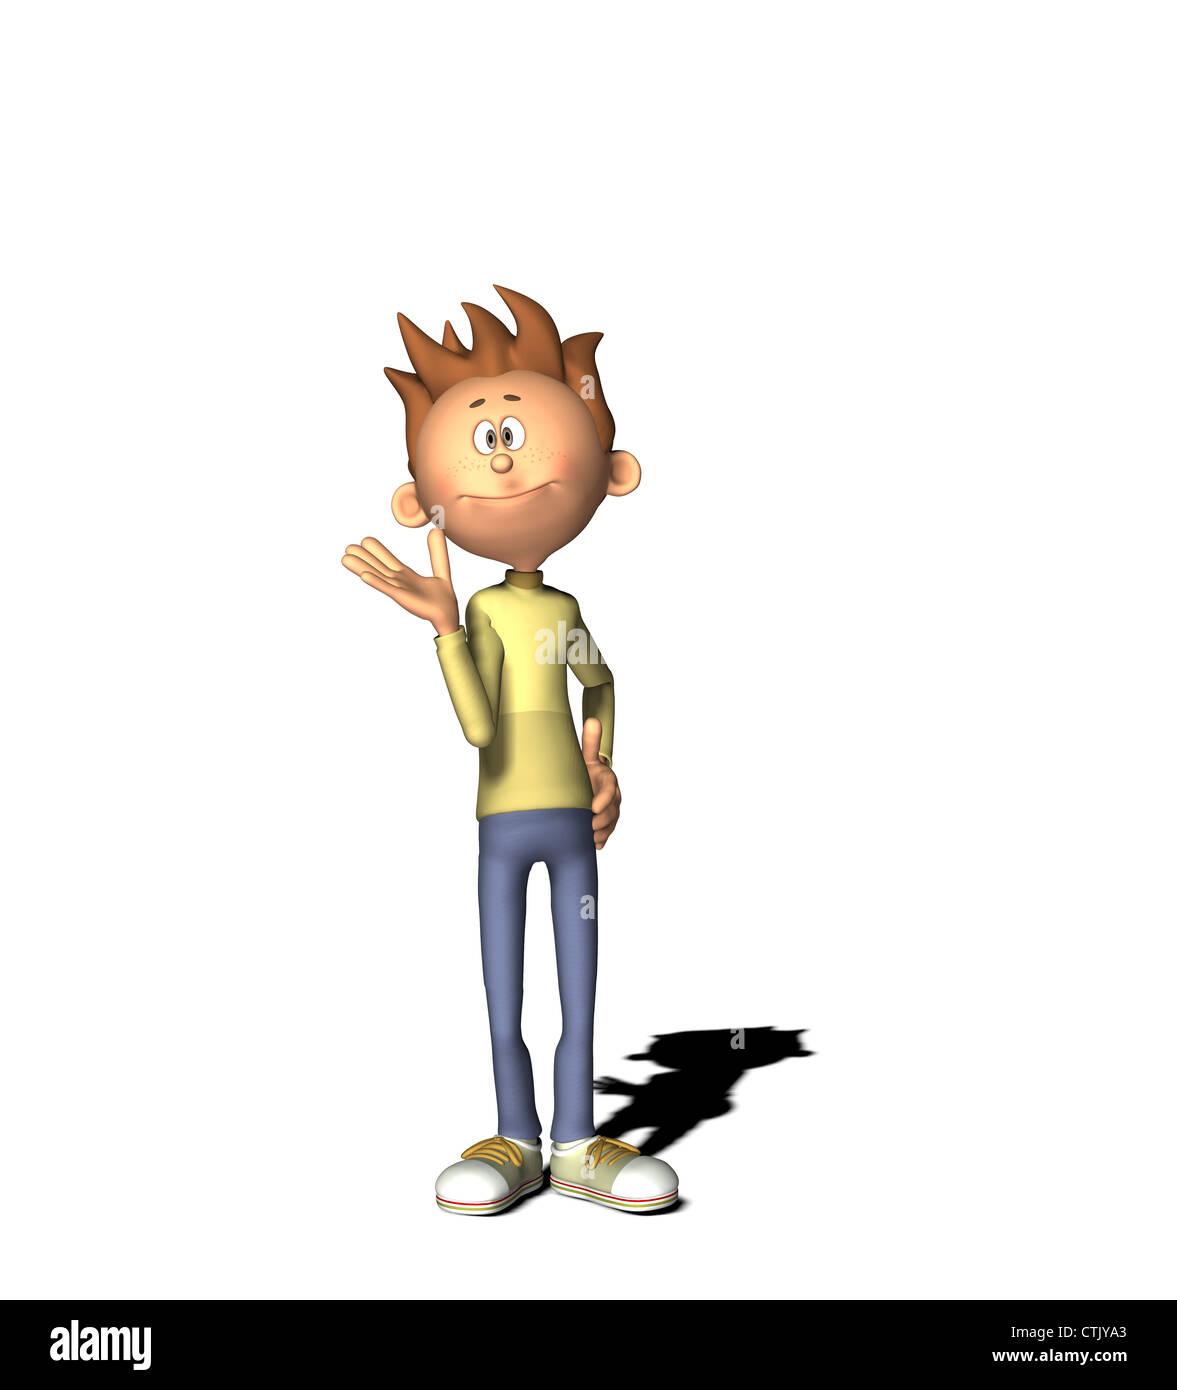 Cartoon-Figur-junge Stockbild